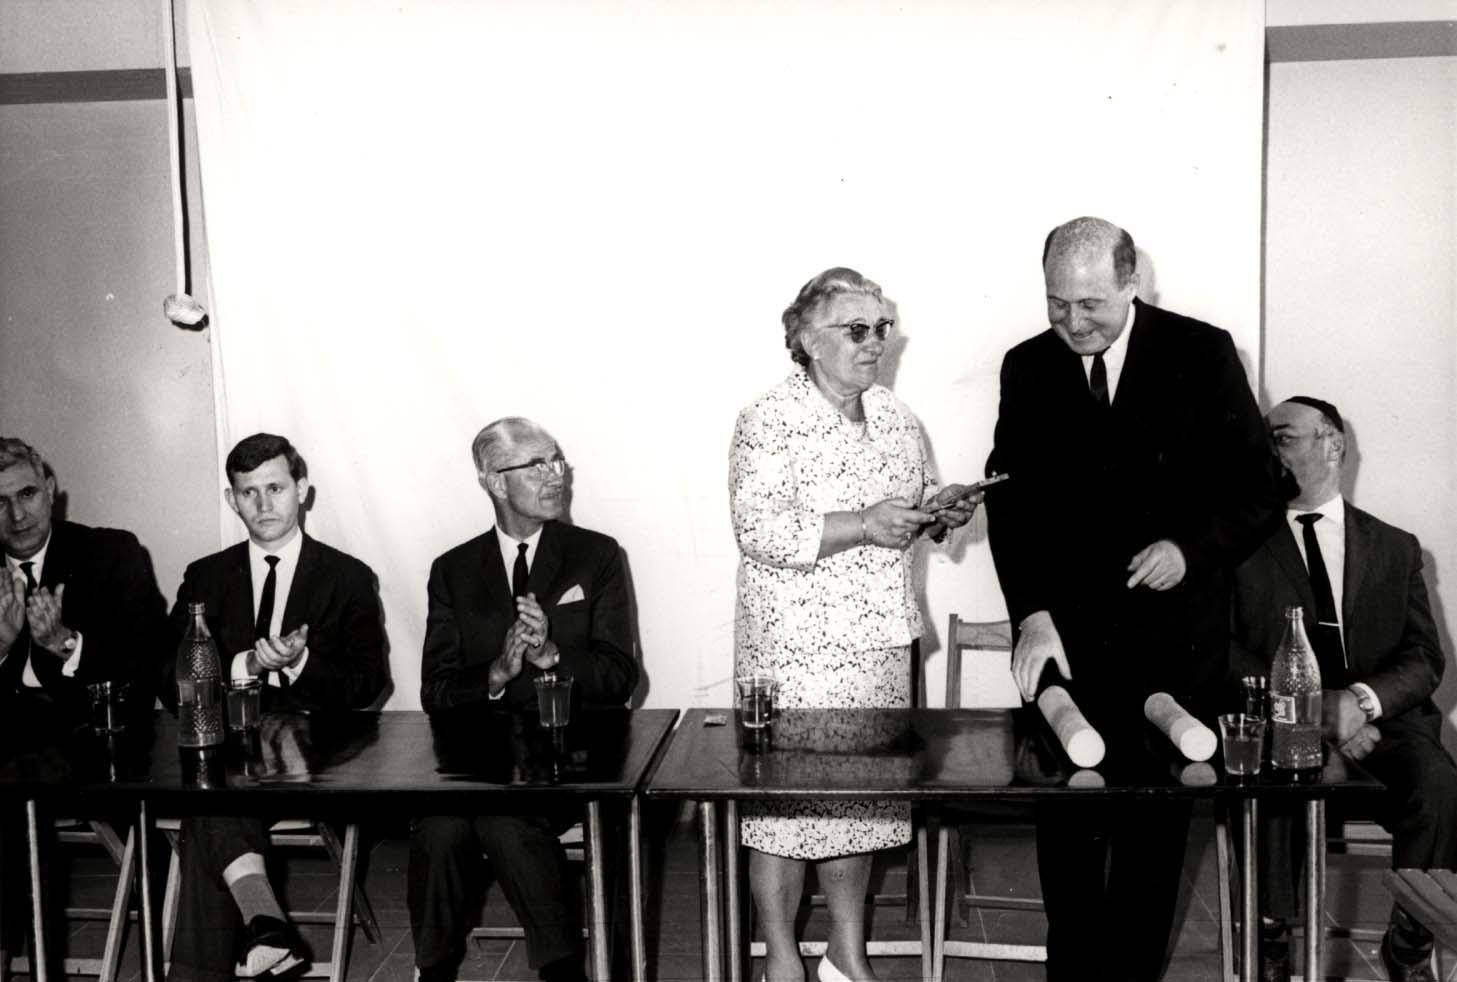 Wijsmuller Gertud receives her Certificate of Honor. Yad Vashem. 13.04.1967